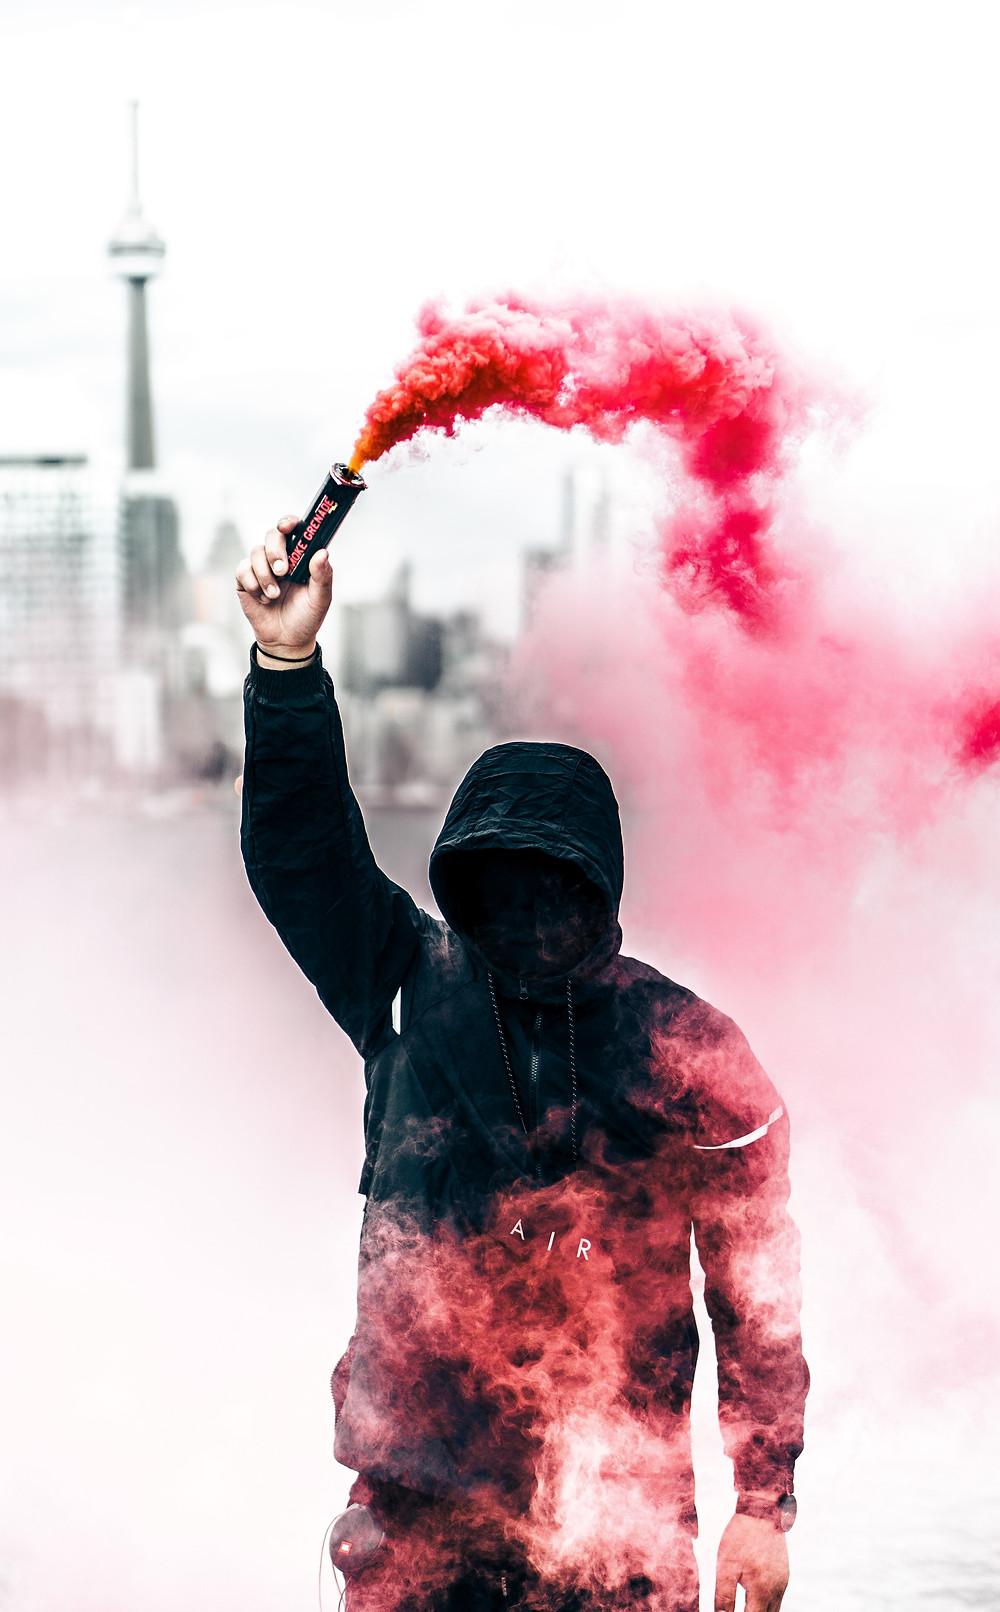 The Obliger Rebellion begins...  Photo by Andre Hunter on Unsplash